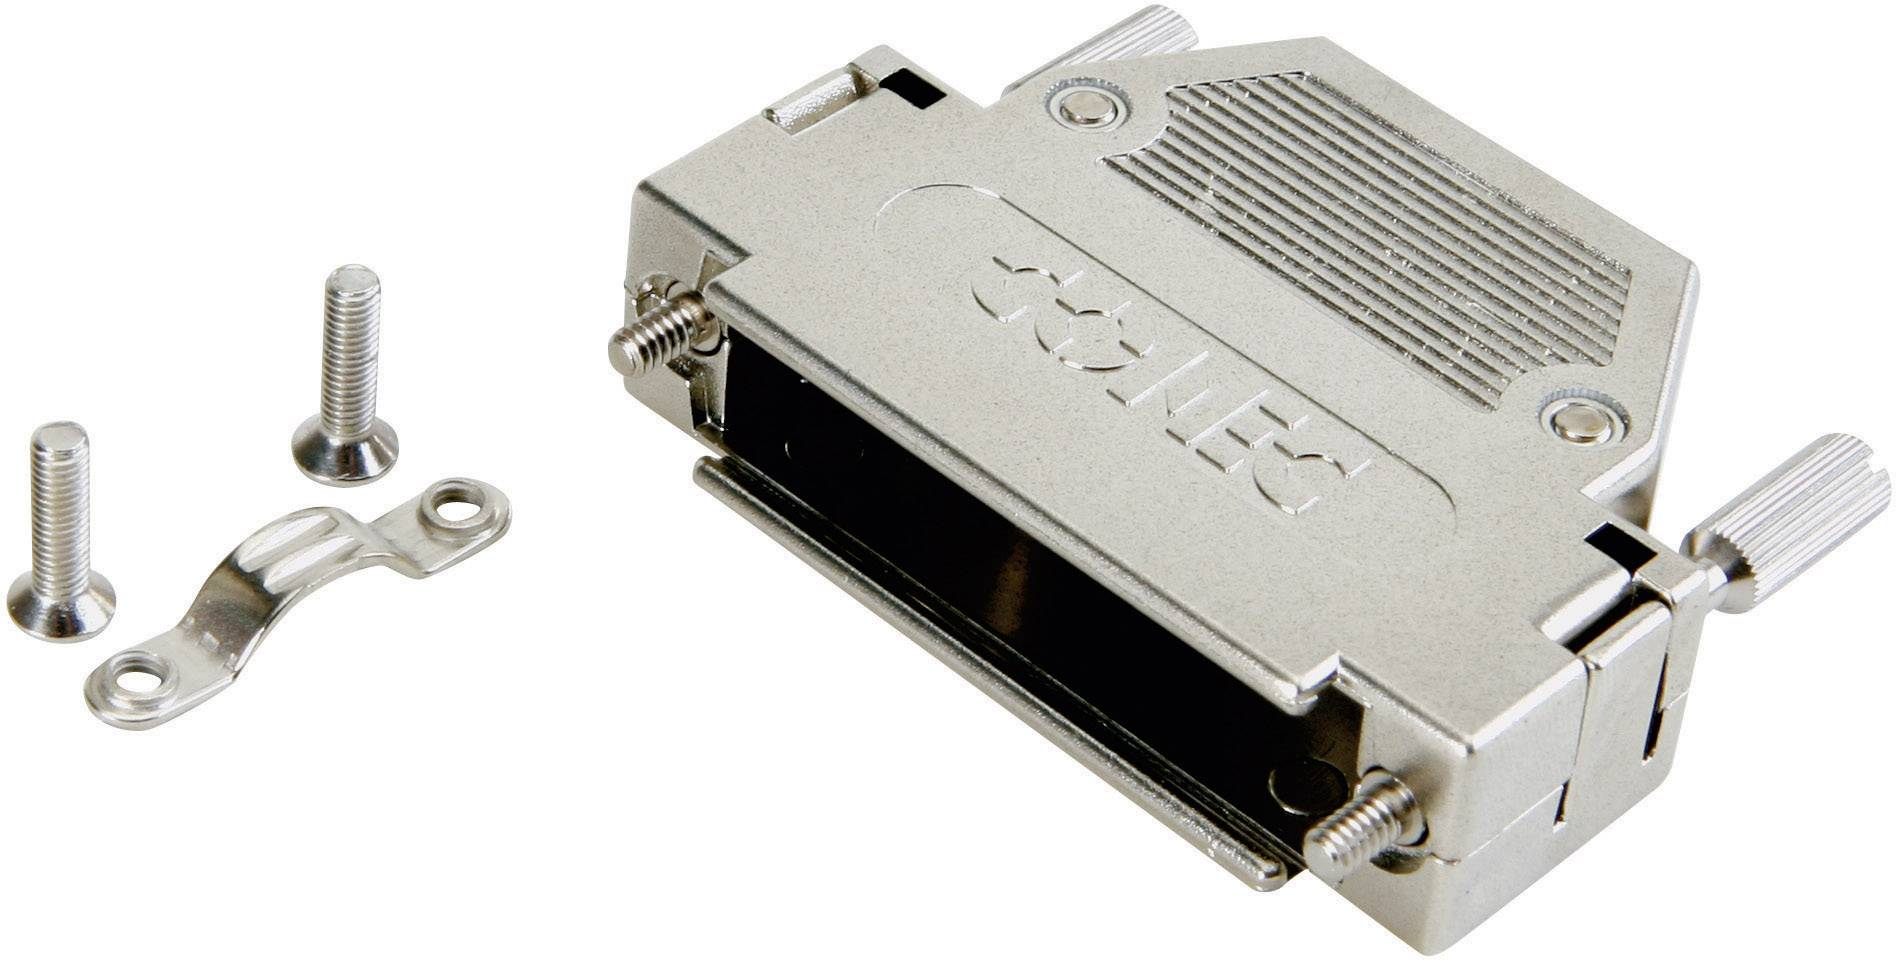 D-SUB pouzdro Conec 165X10939XE 165X10939XE, pólů 37, plast, pokovený, 180 °, stříbrná, 1 ks